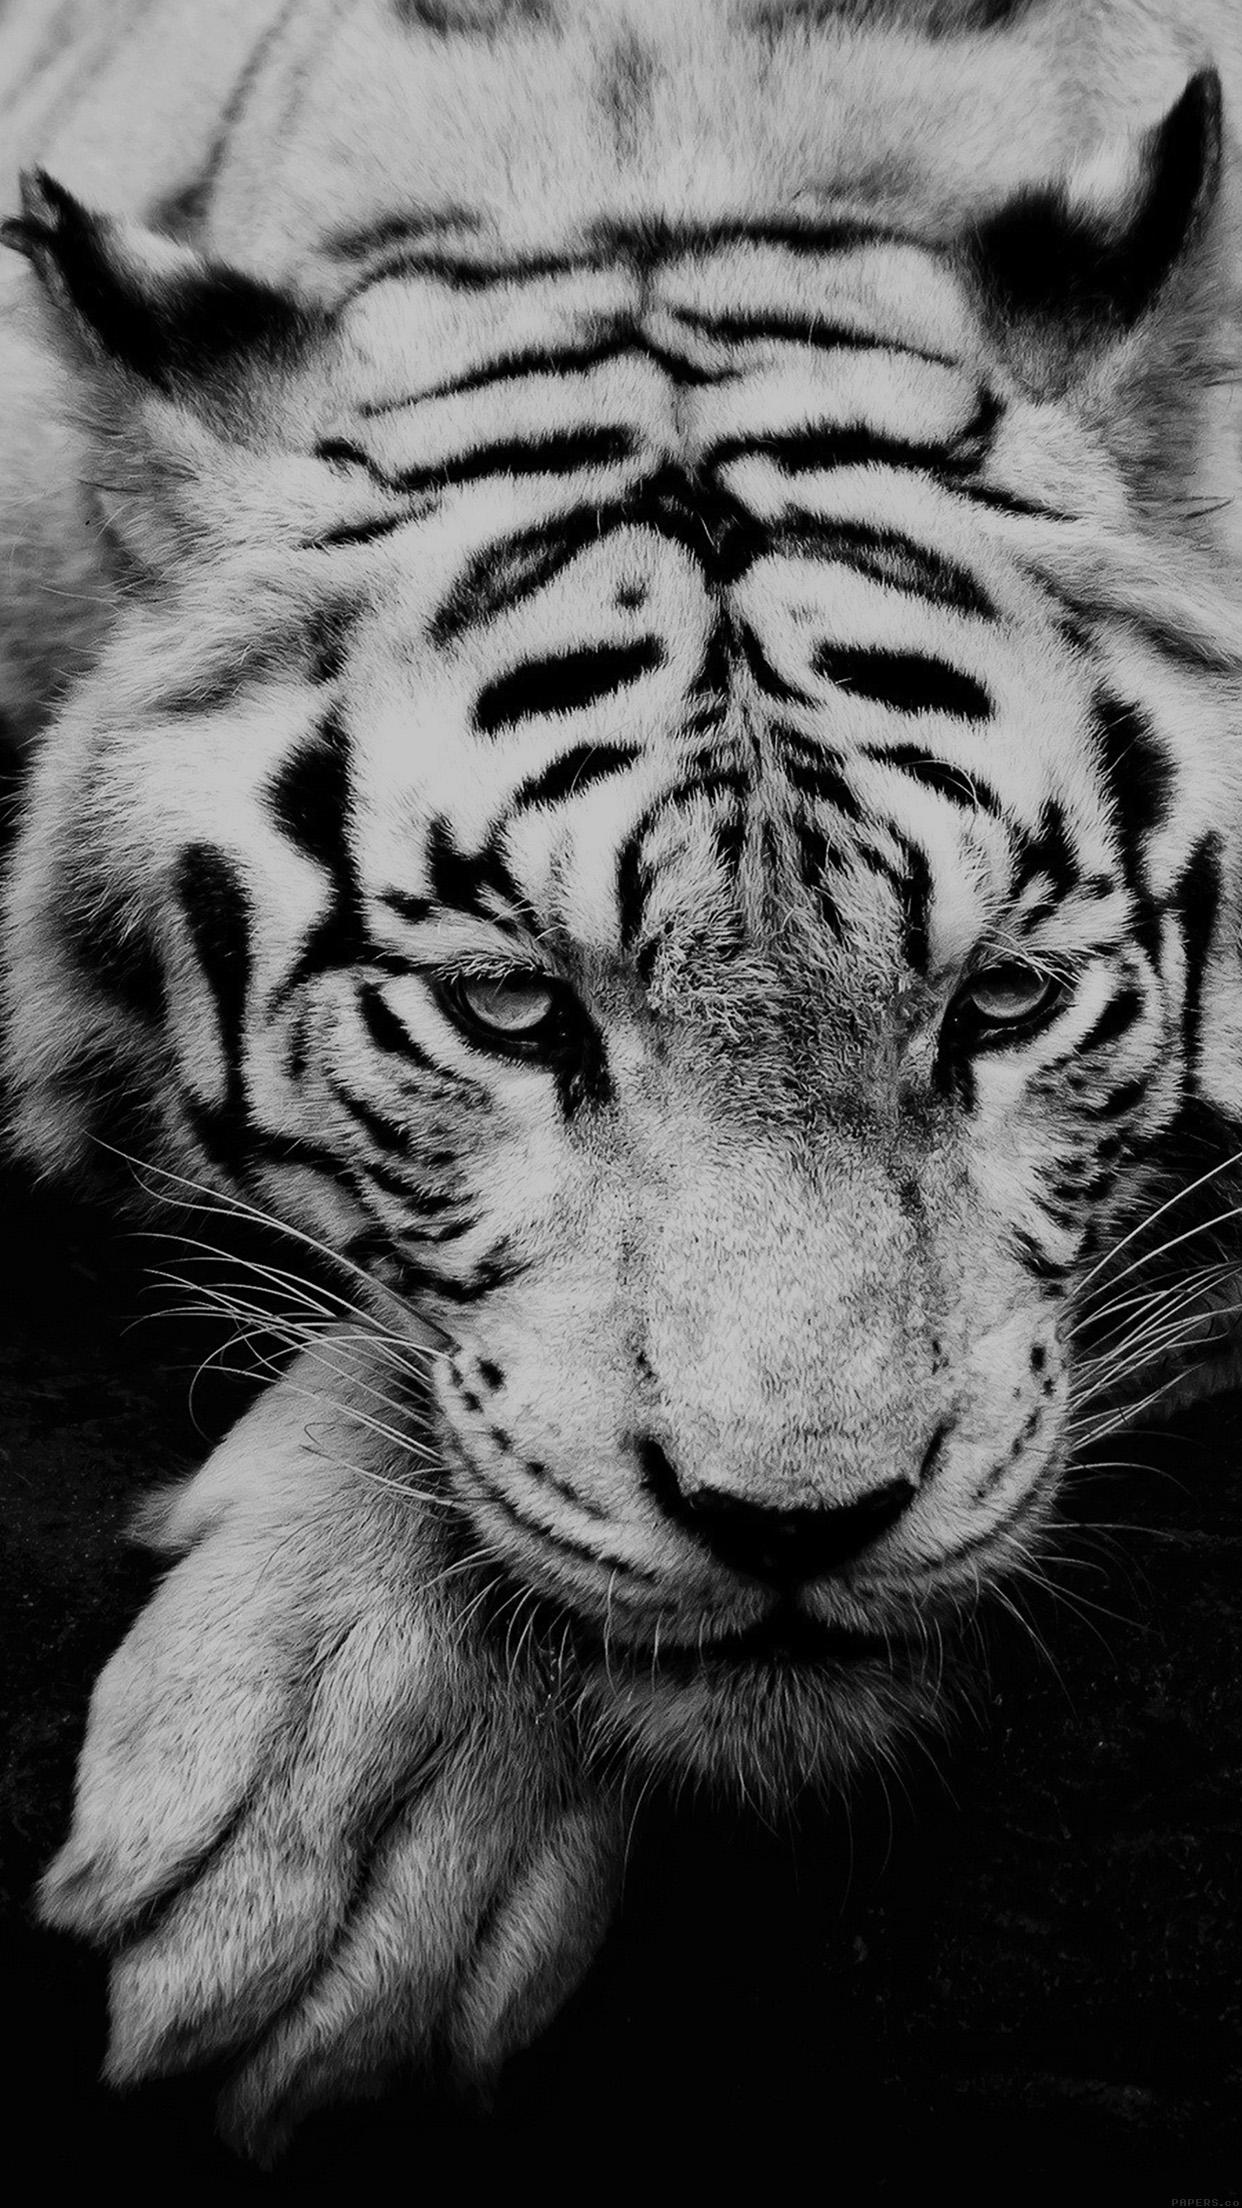 47 Black Tiger Wallpaper On Wallpapersafari